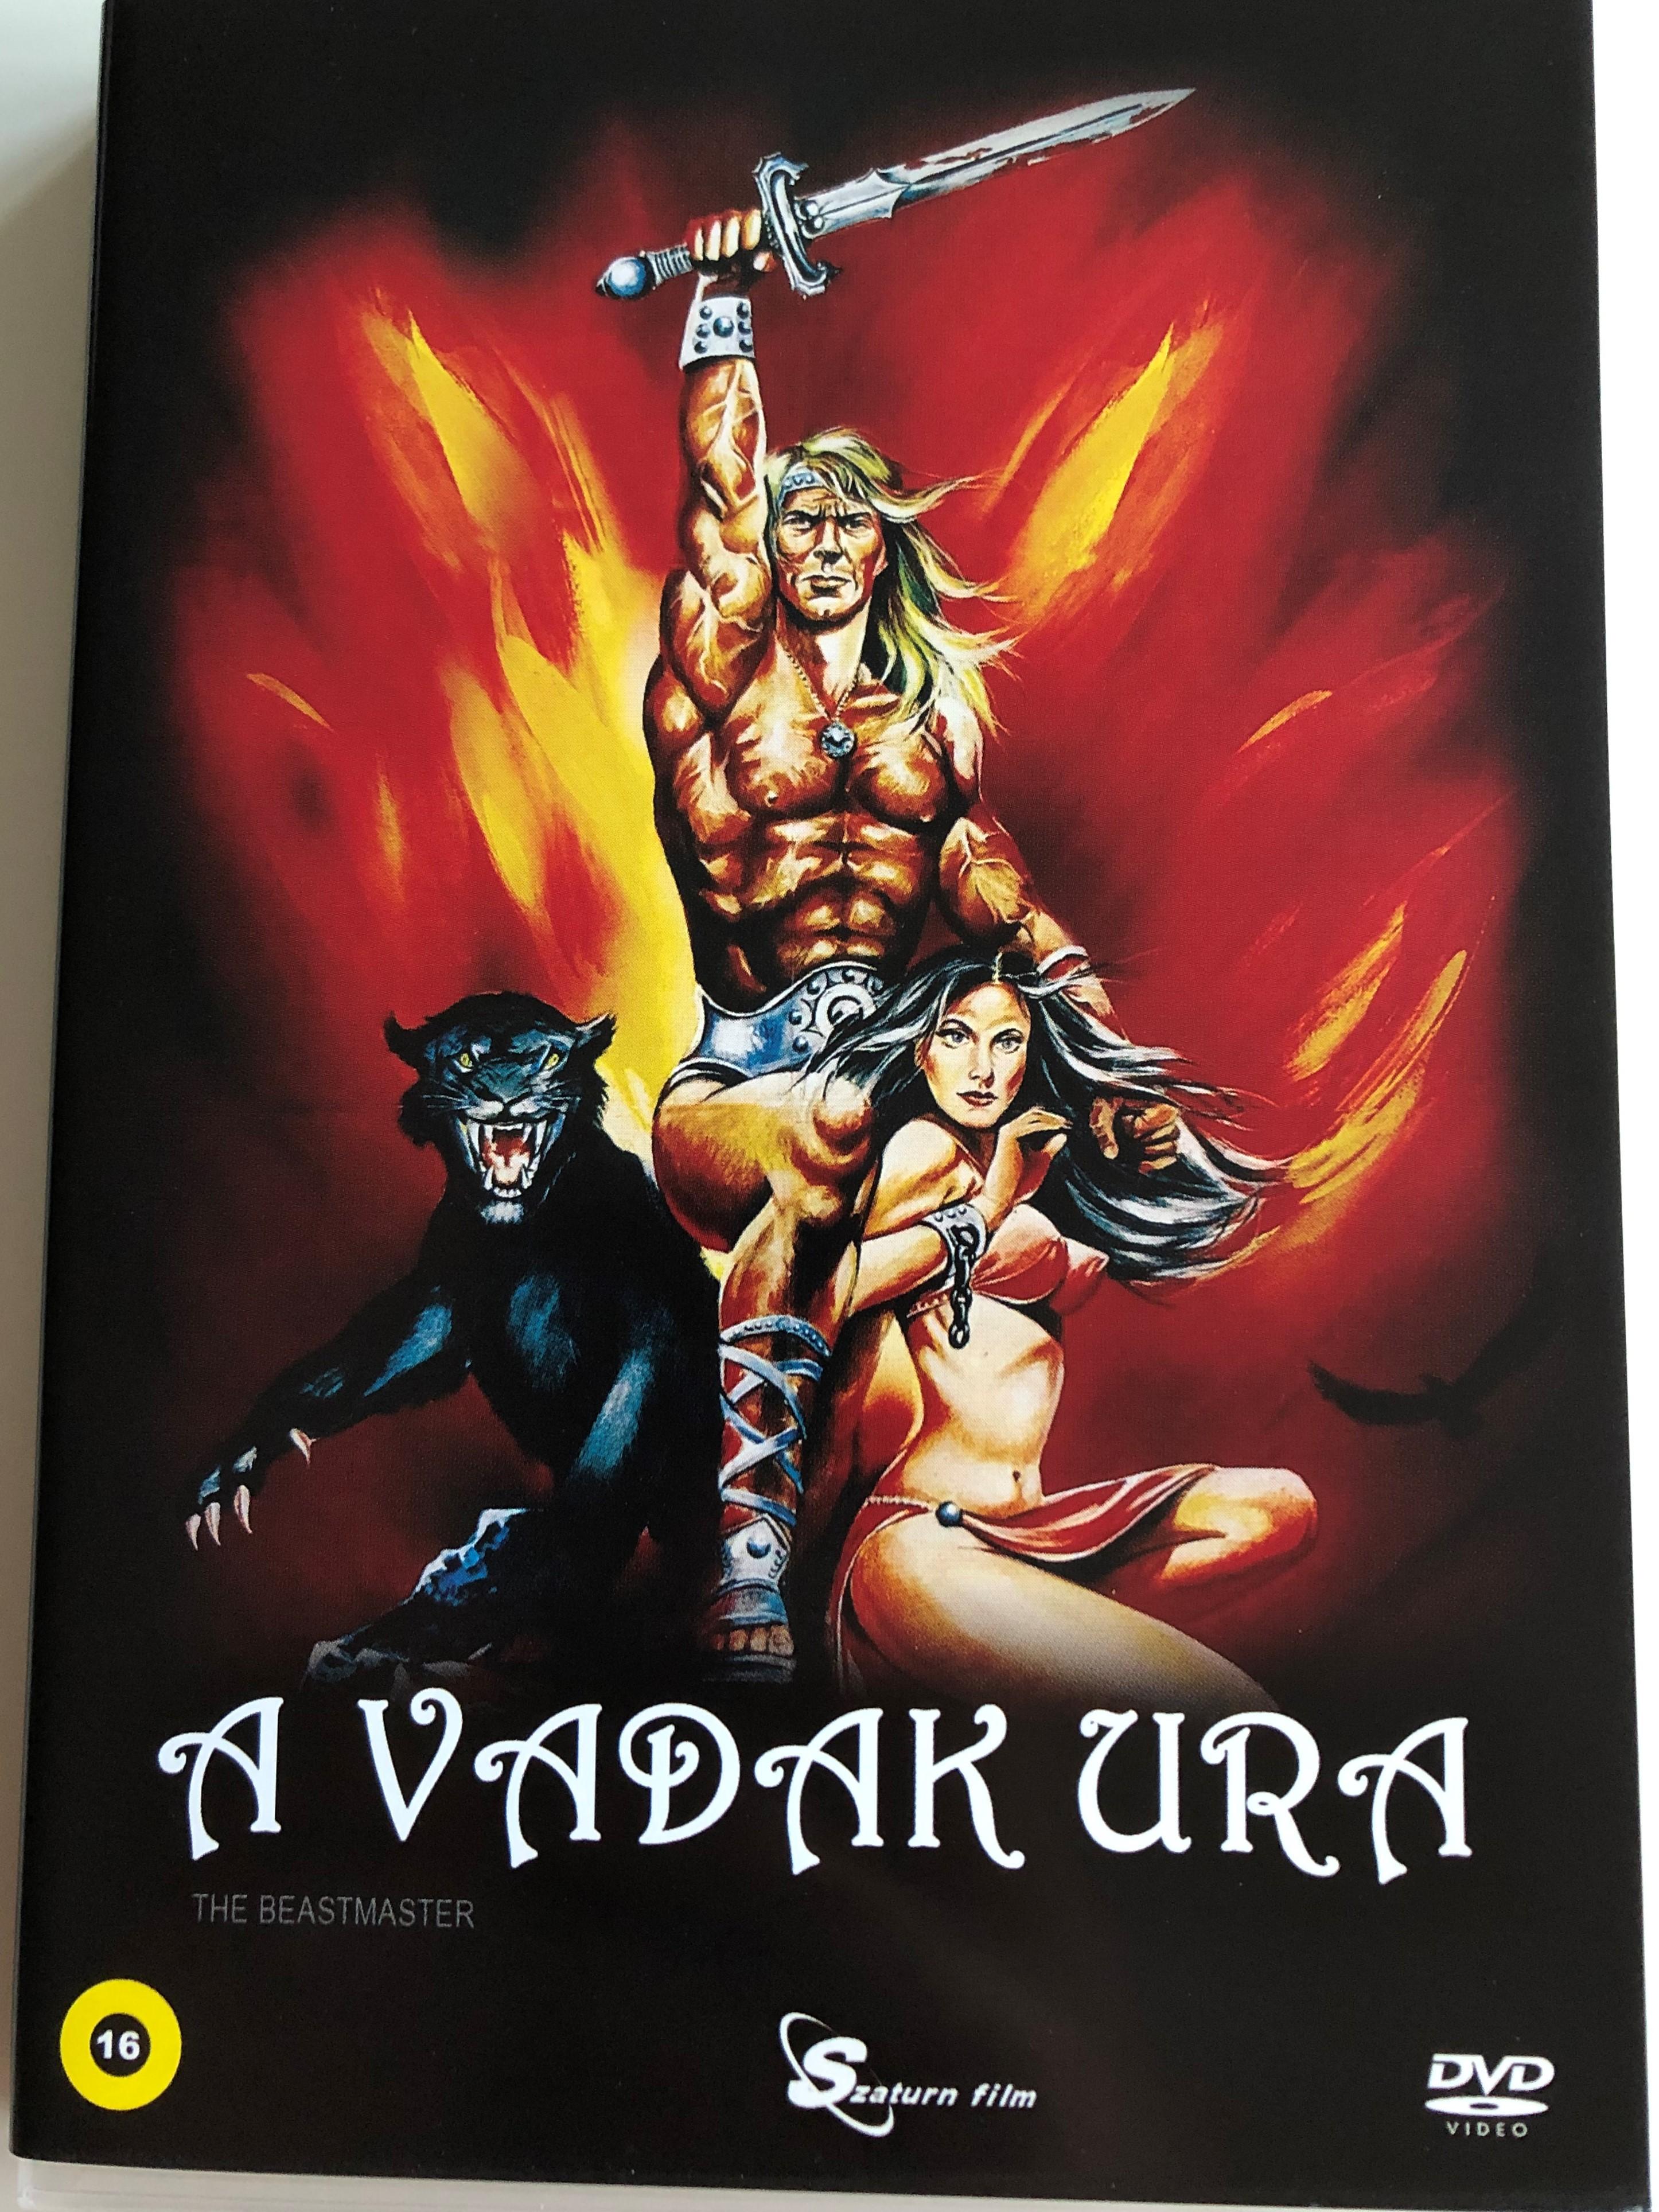 the-beastmaster-dvd-1982-a-vadak-ura-directed-by-don-coscarelli-1.jpg